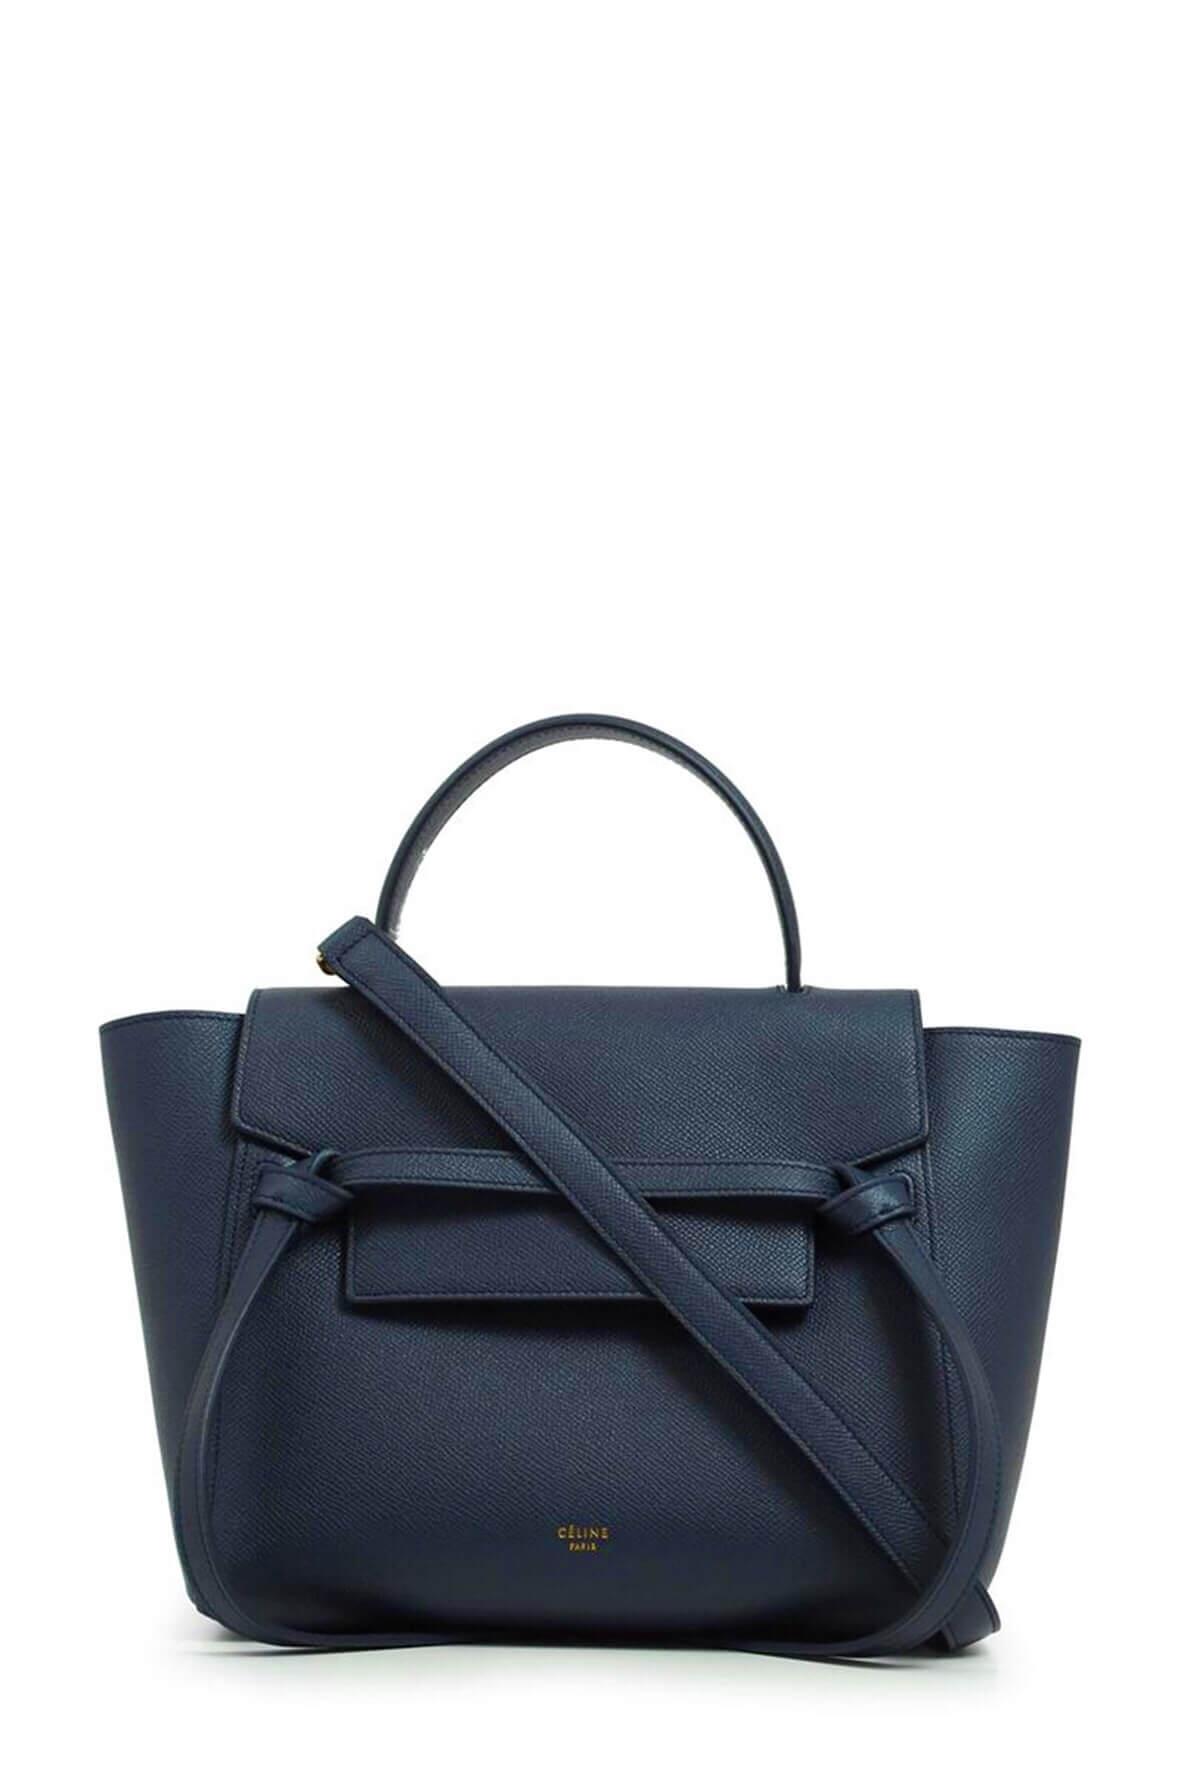 Micro Belt Bag Dark Navy By Celine Style Theory Bags